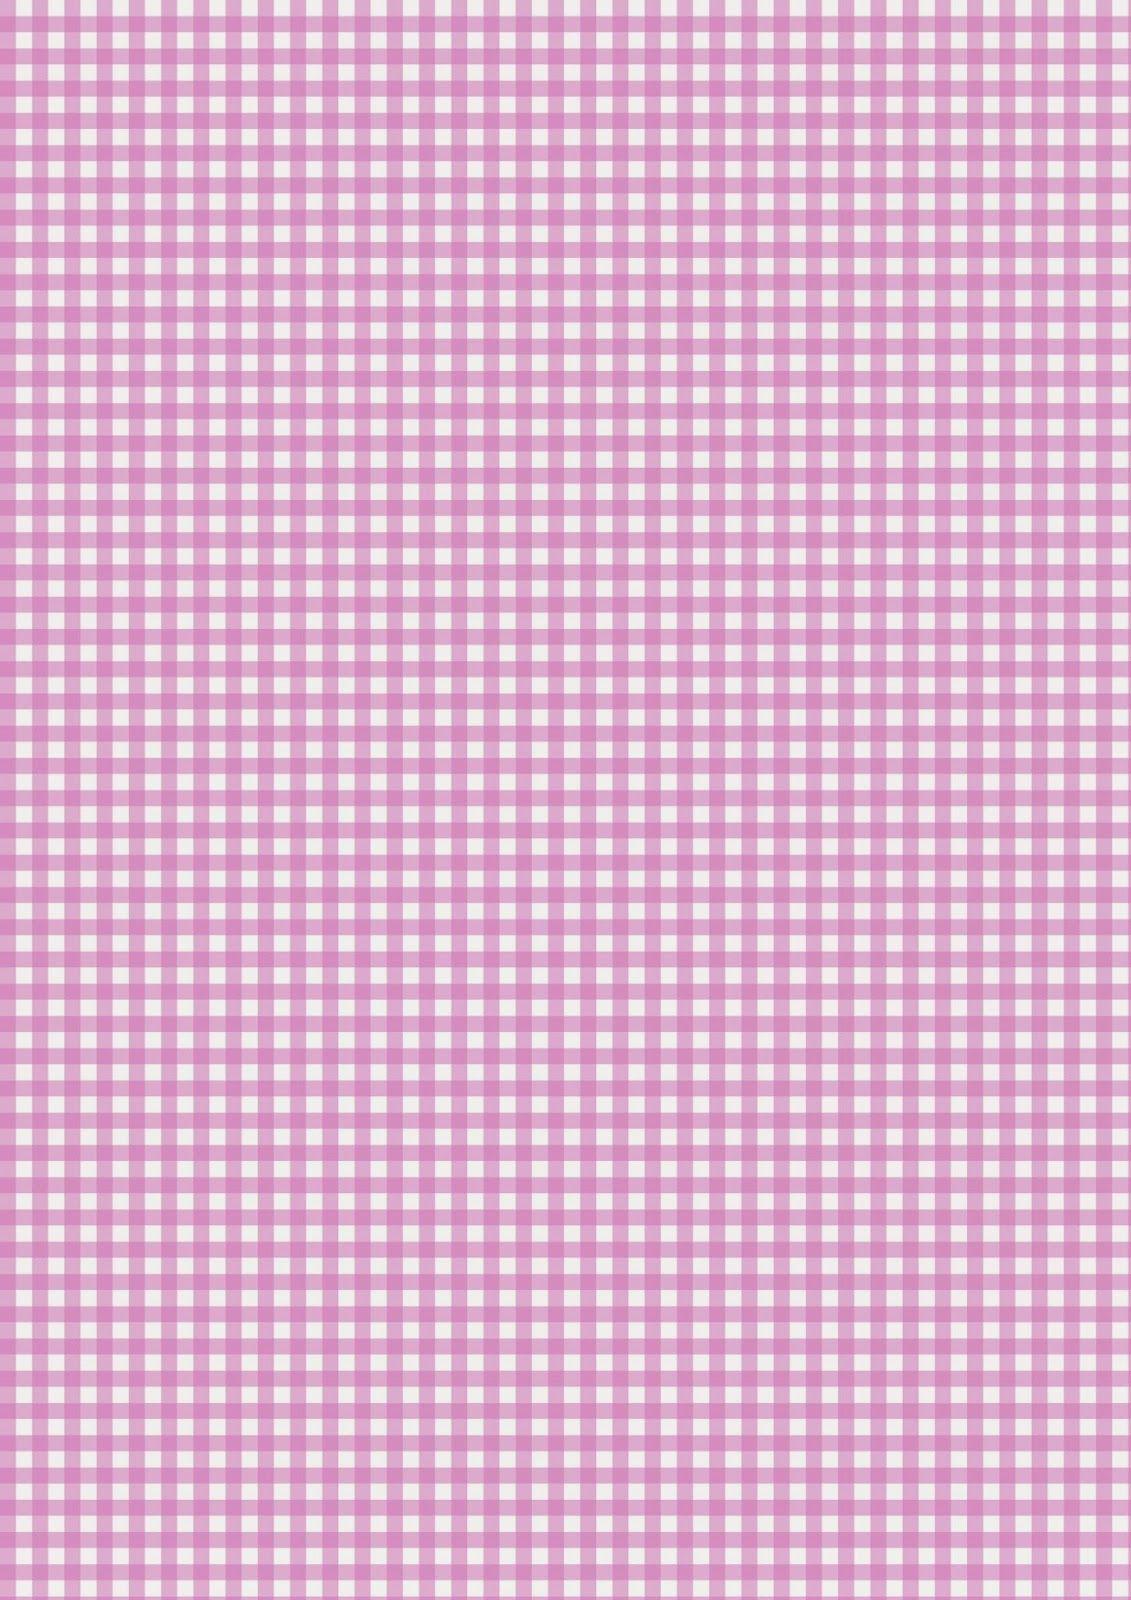 Cicideko - Pink Gingham